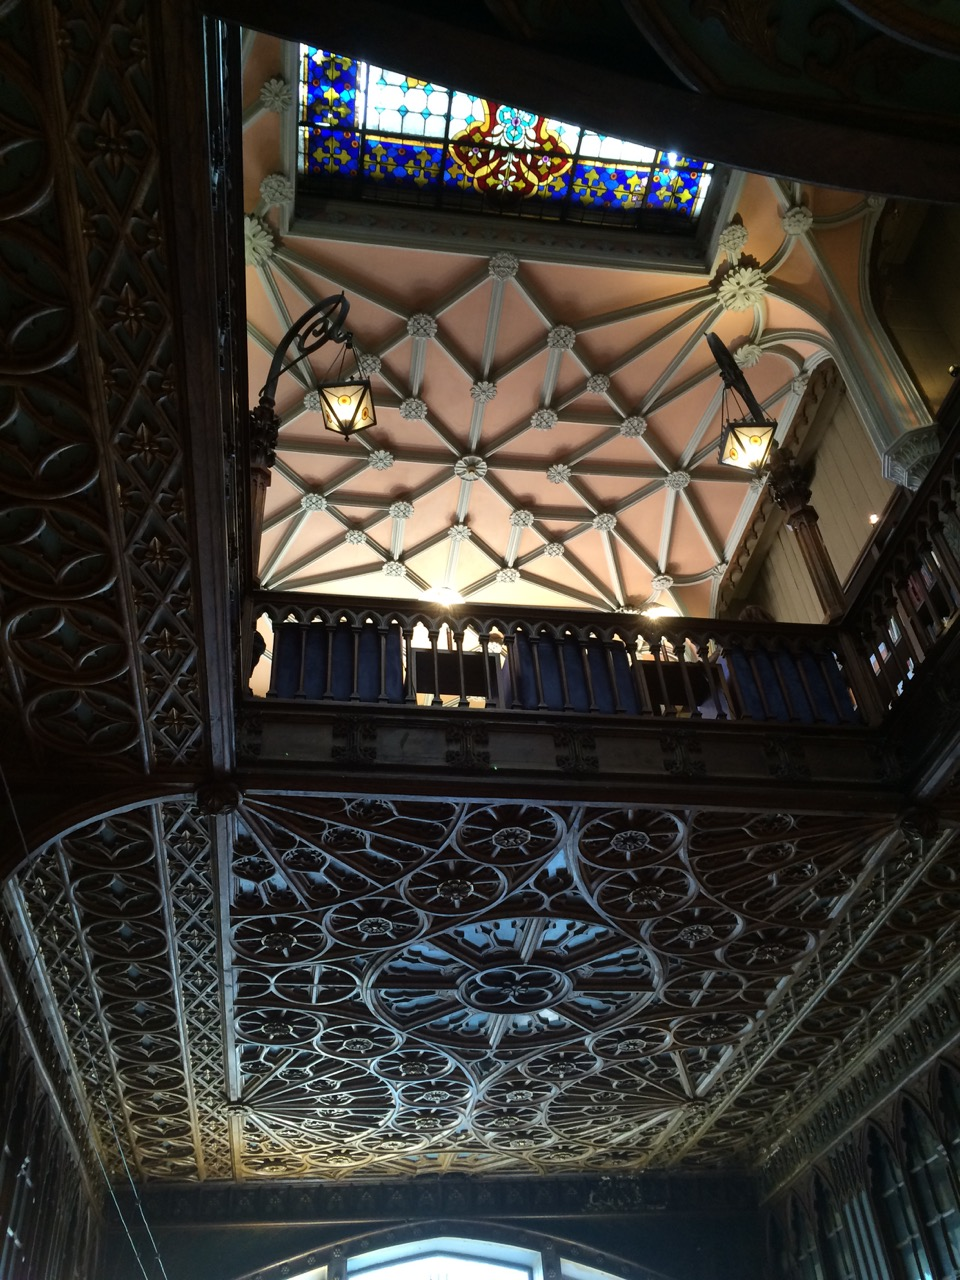 The interior details